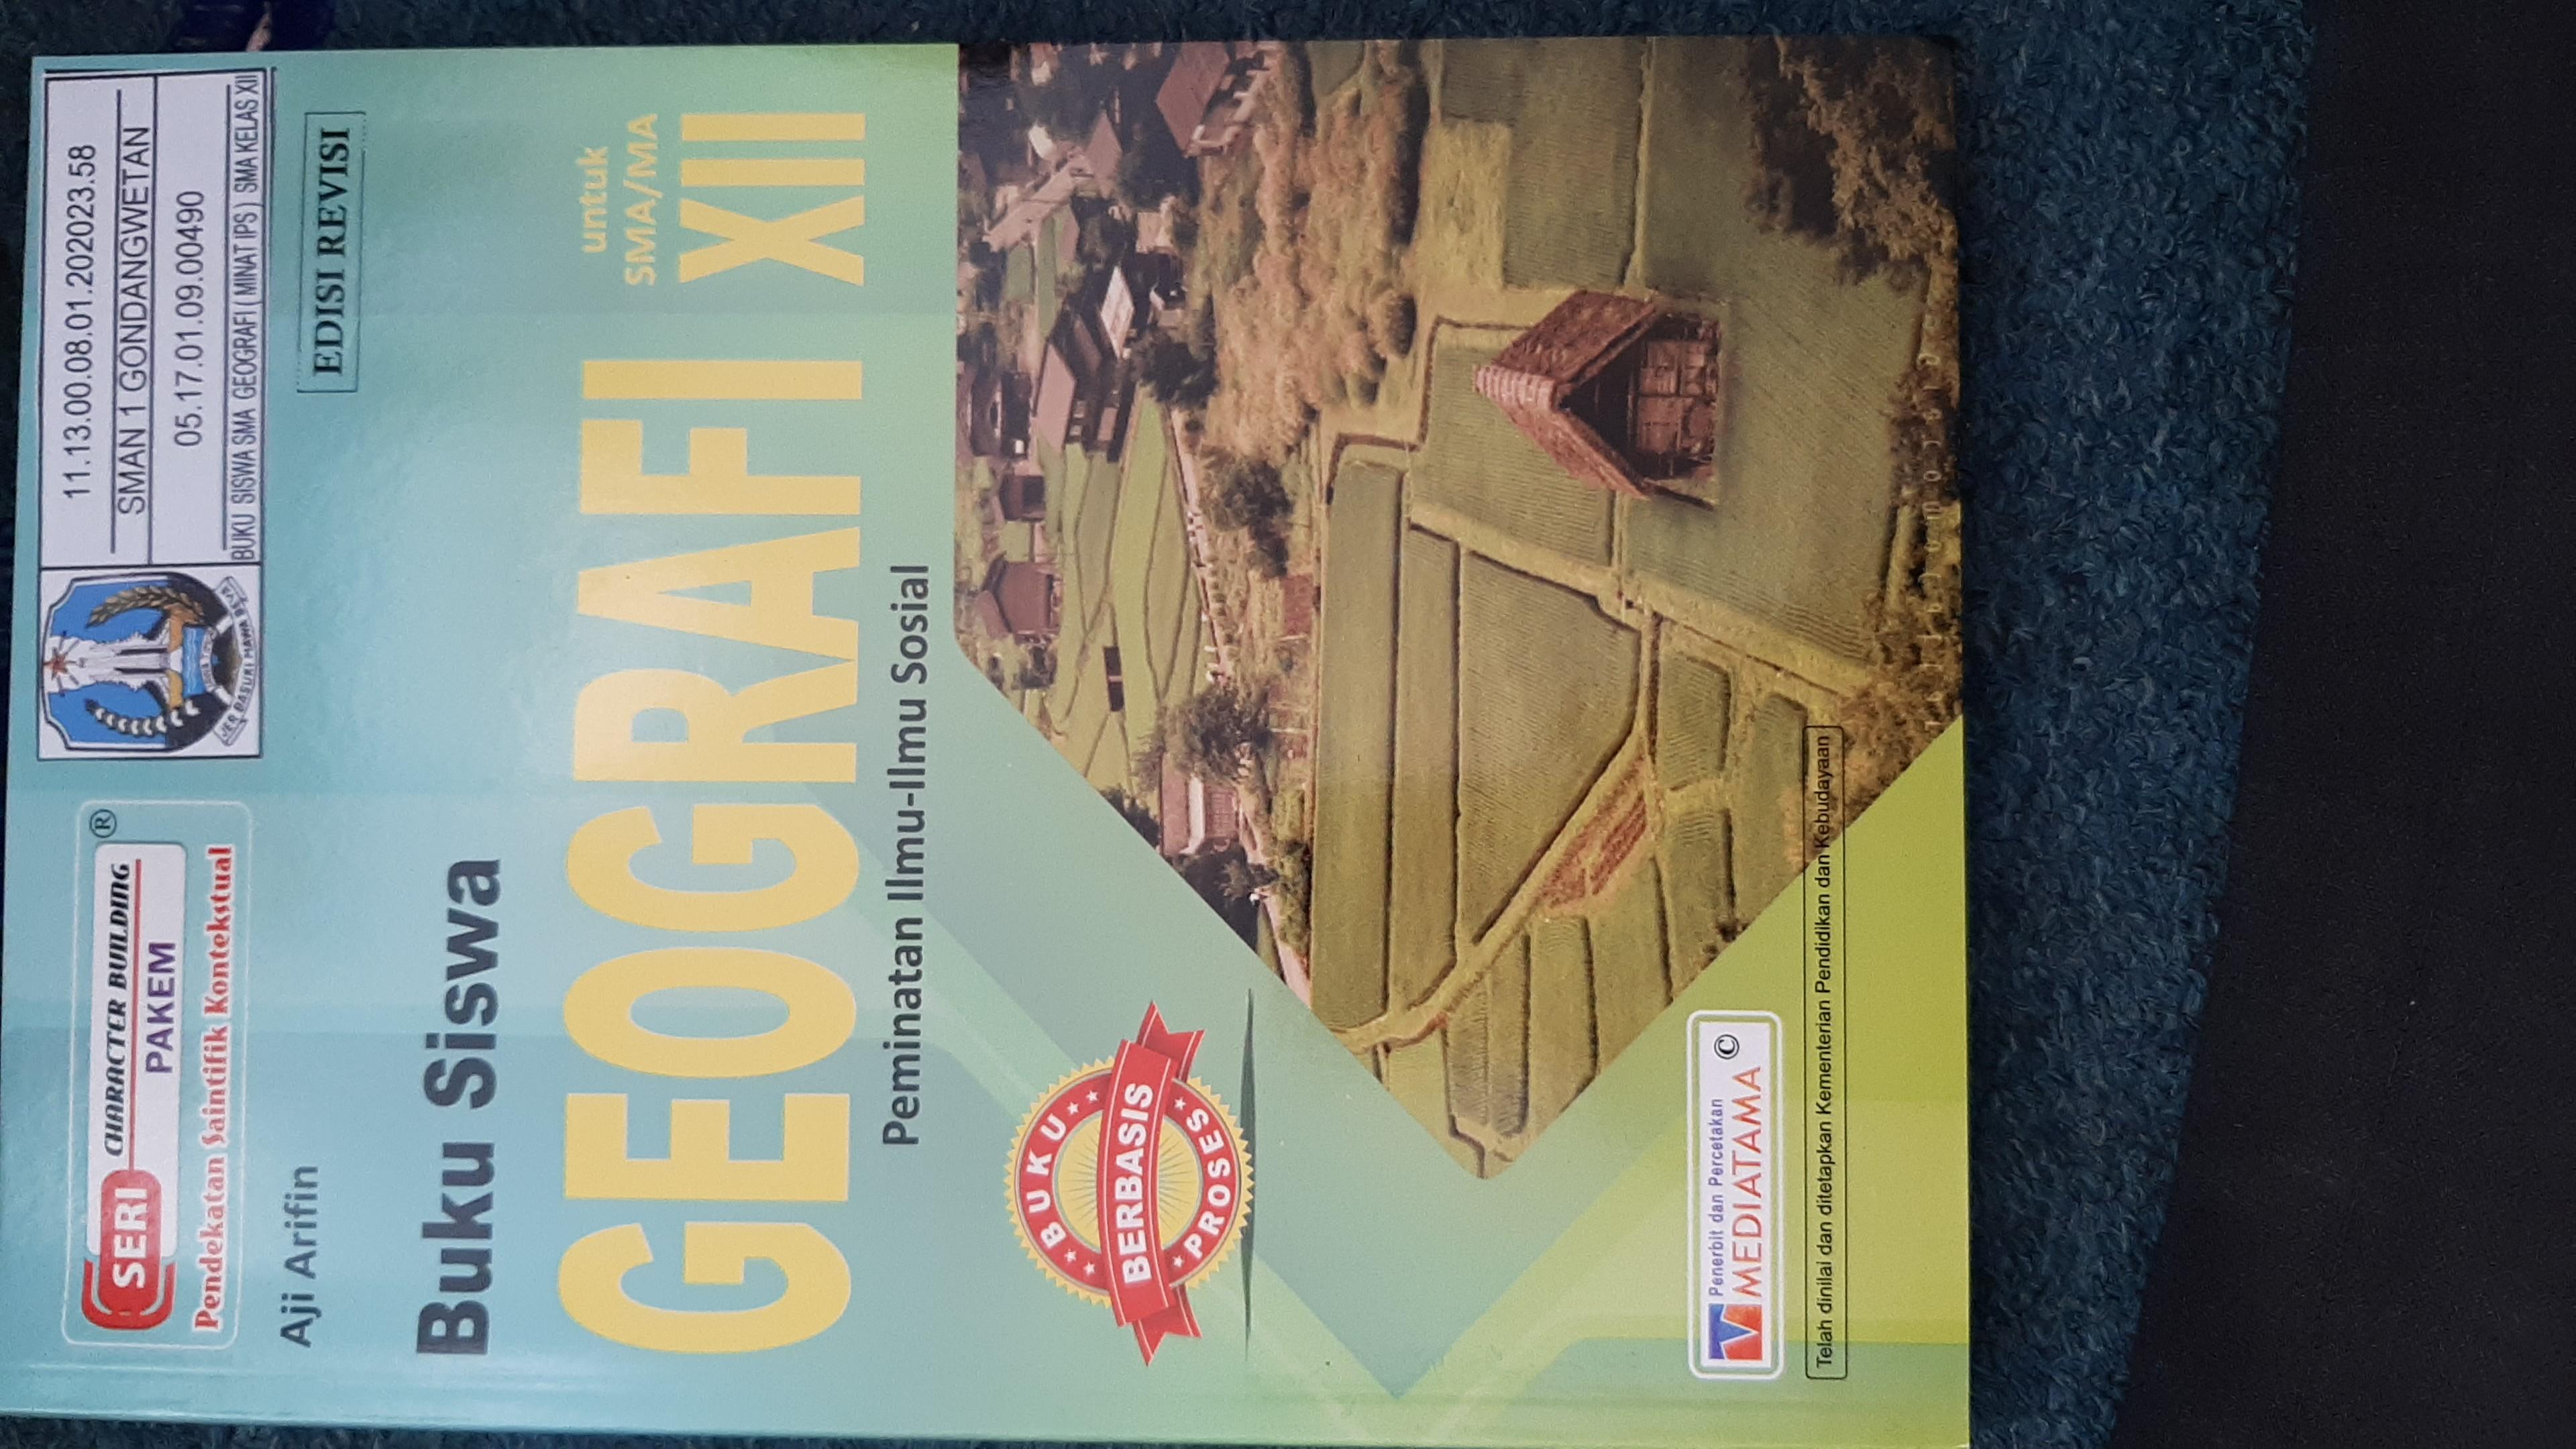 Buku Siswa Geografi Untuk SMA/MA XII Peminatan Ilmu-Ilmu Sosial